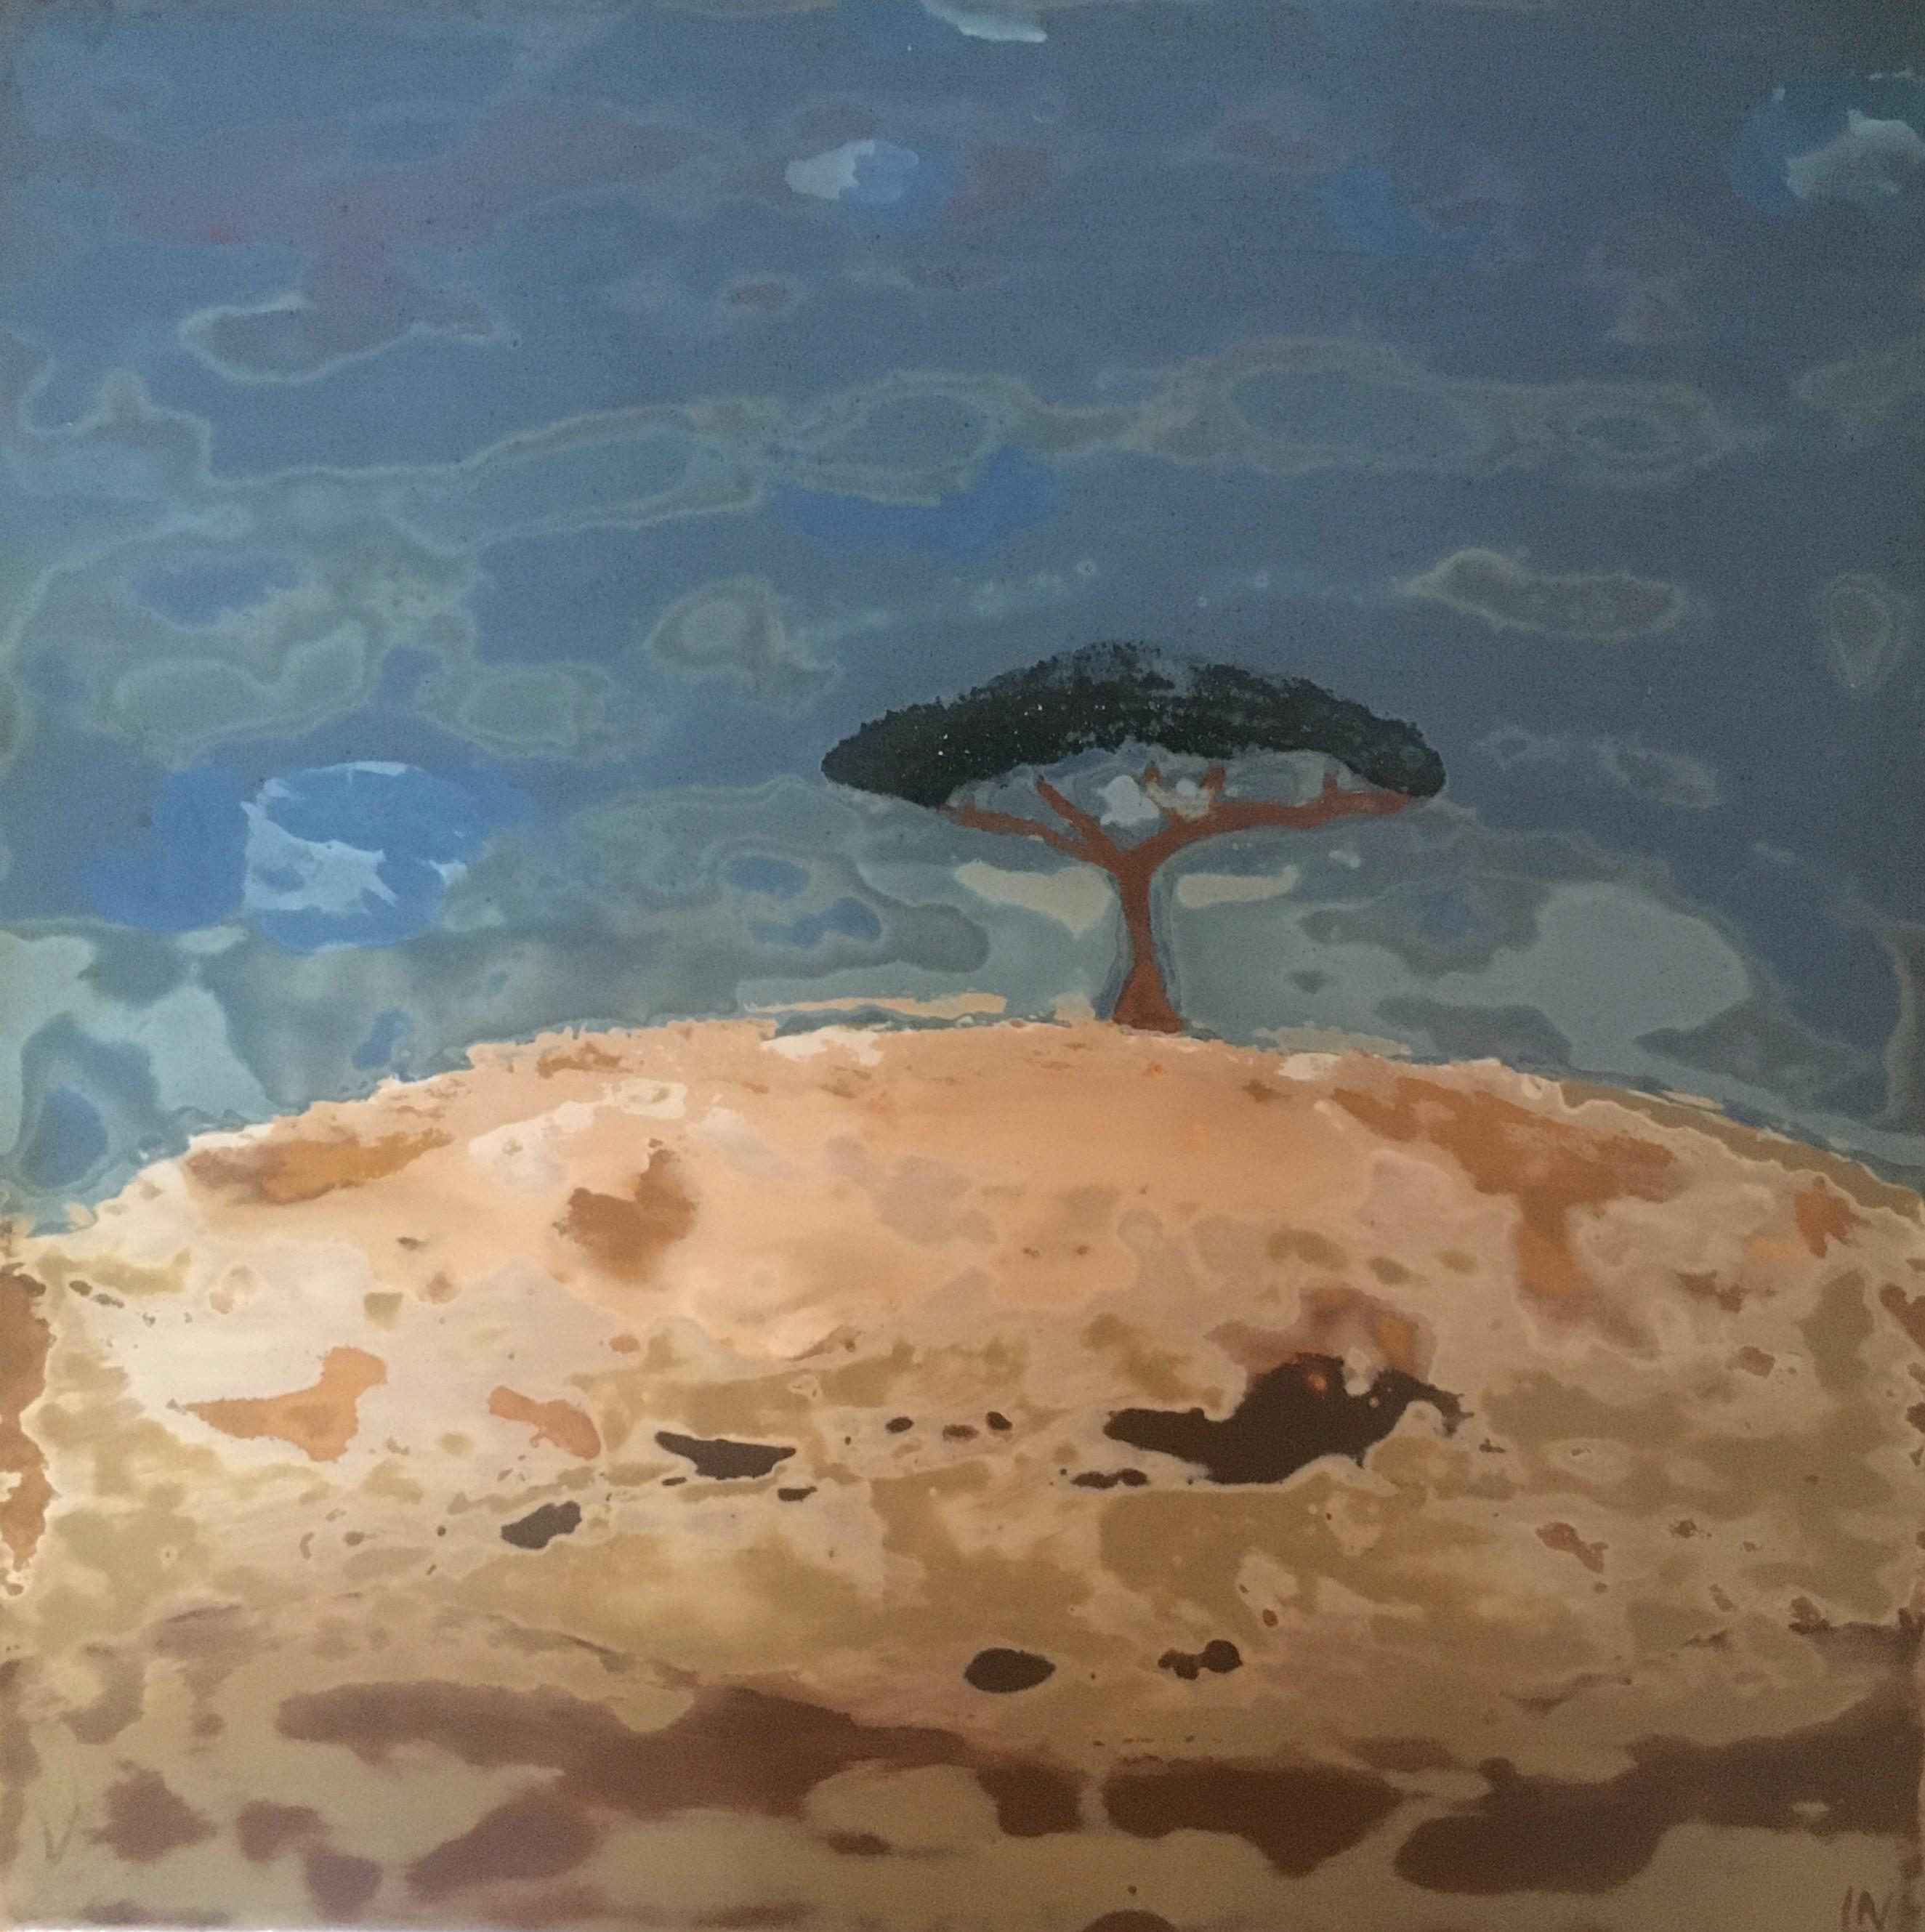 Nathalie_Lambeaux_-_arbre_desert[1]